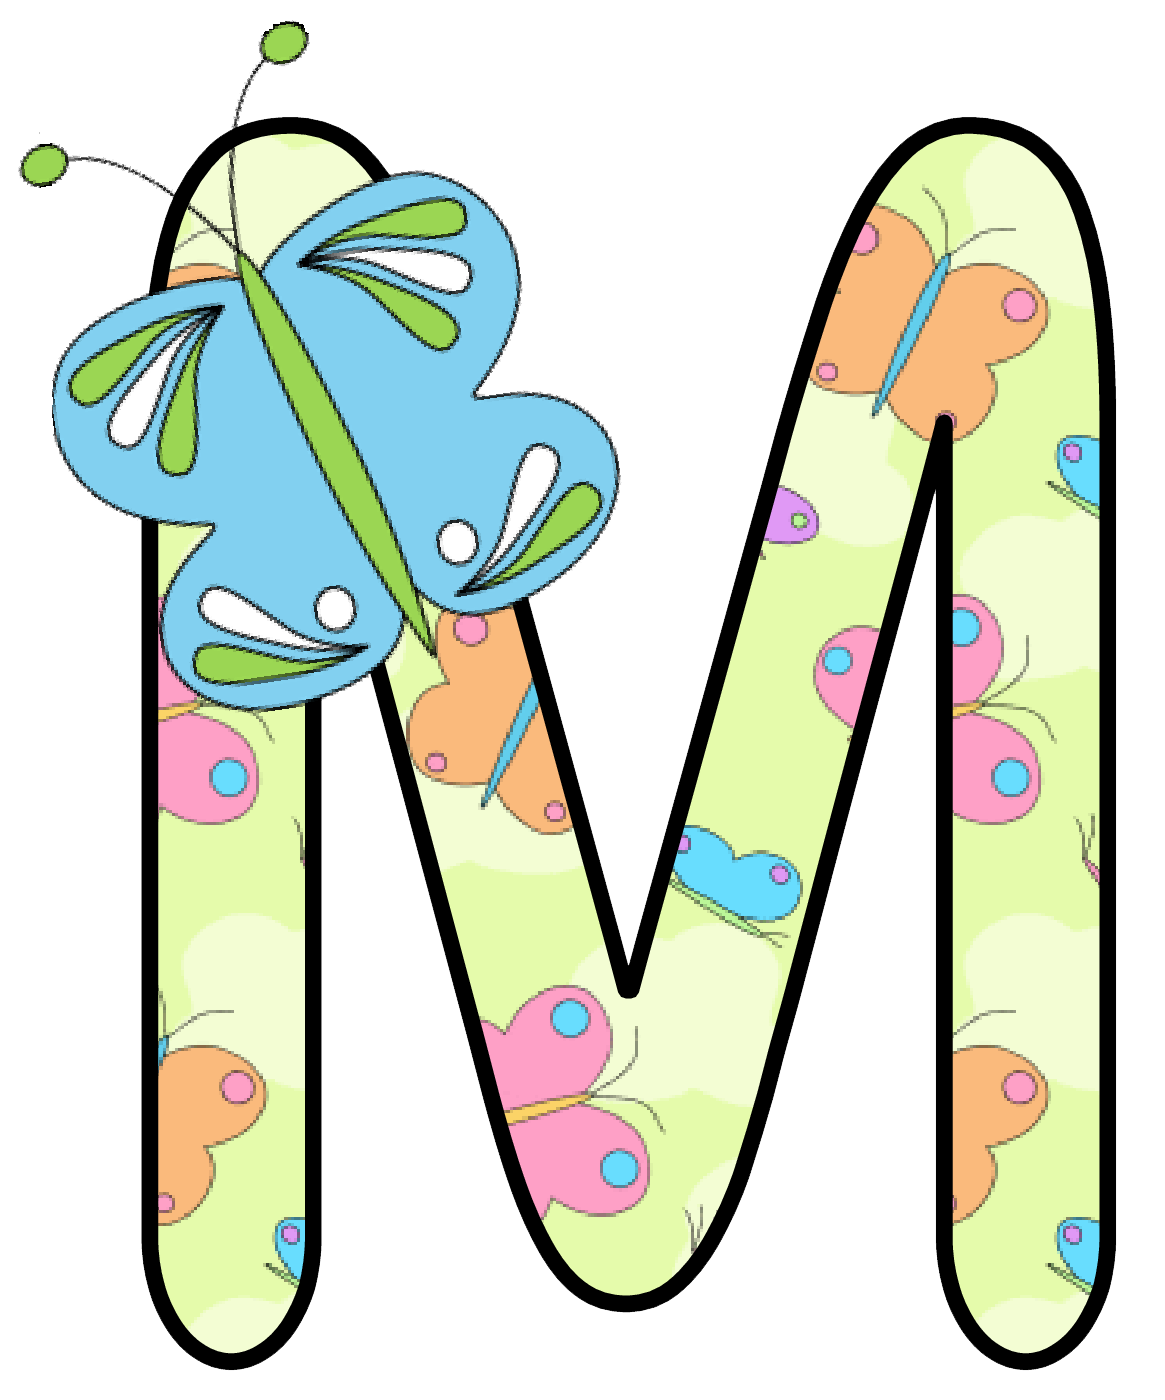 Ch b alfabeto mariposas. Memories clipart lettering